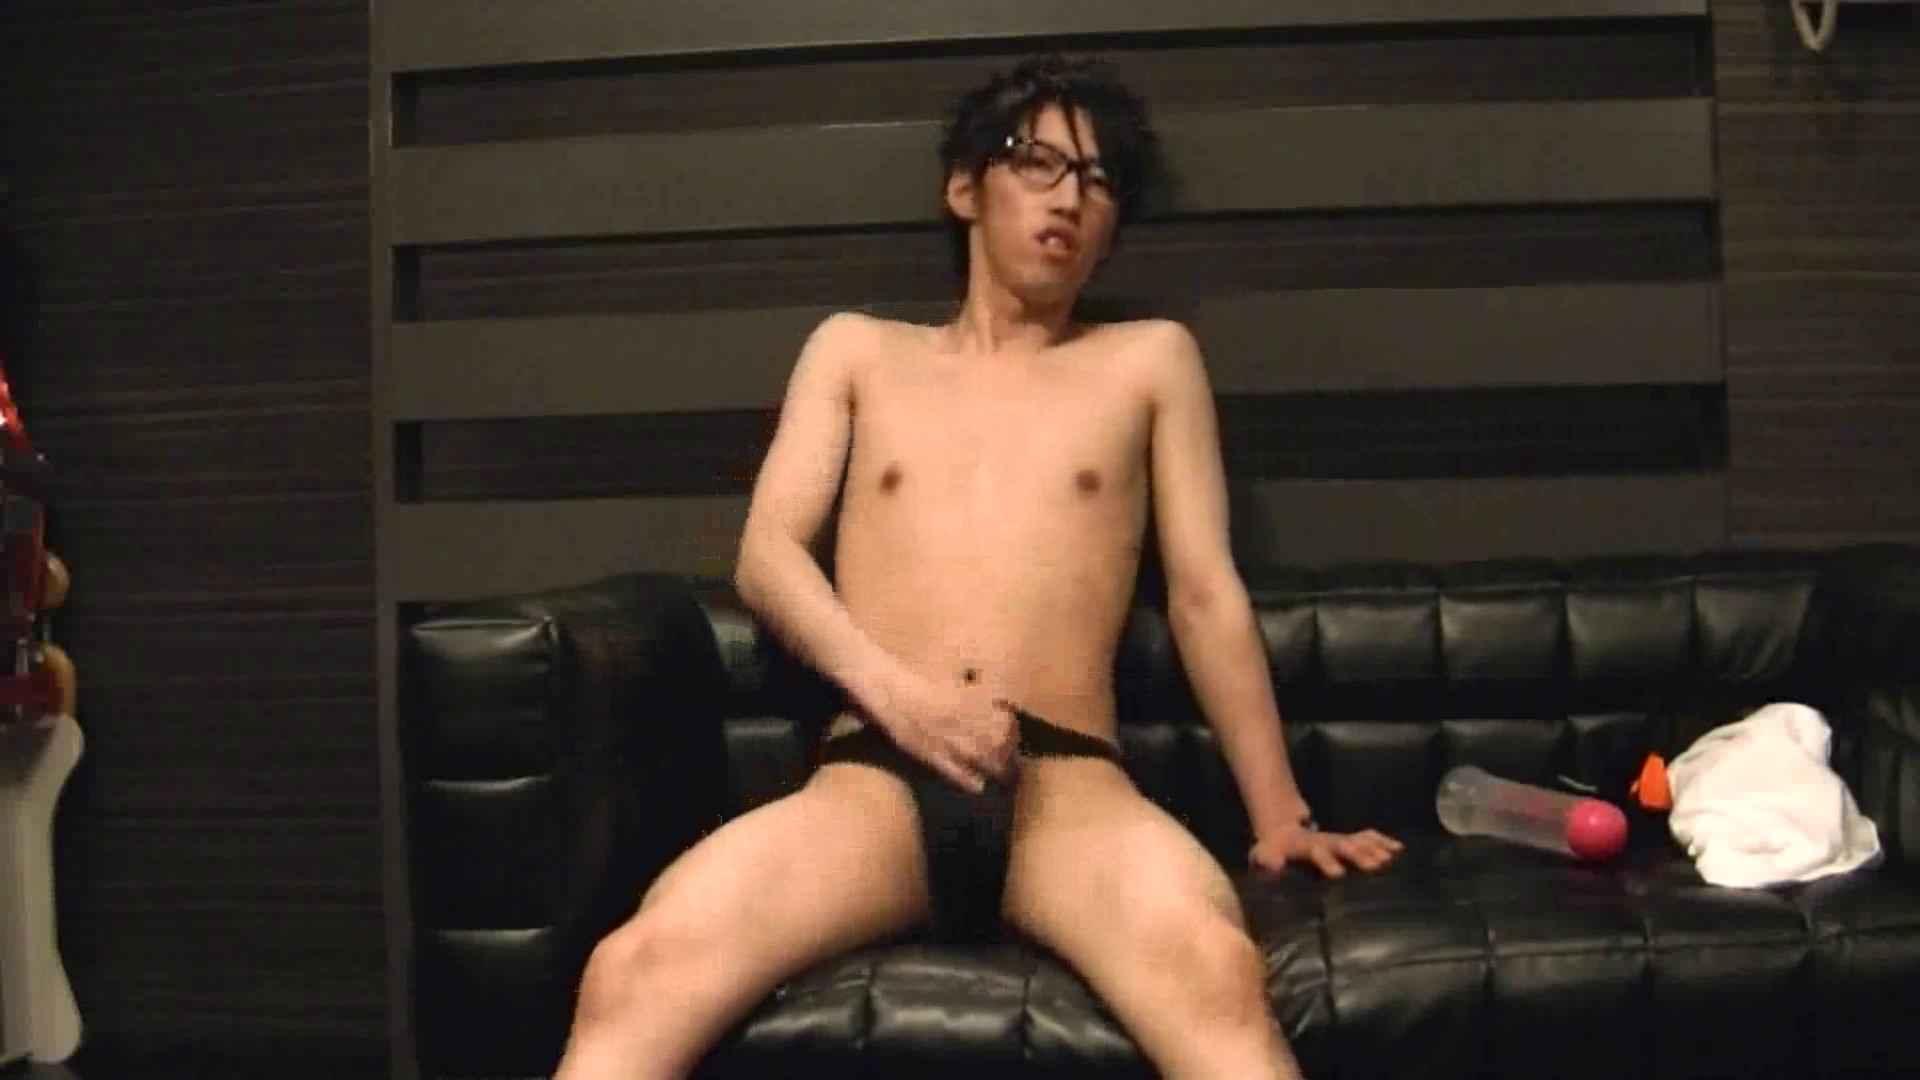 ONA見せカーニバル!! Vol3 男  93pic 53